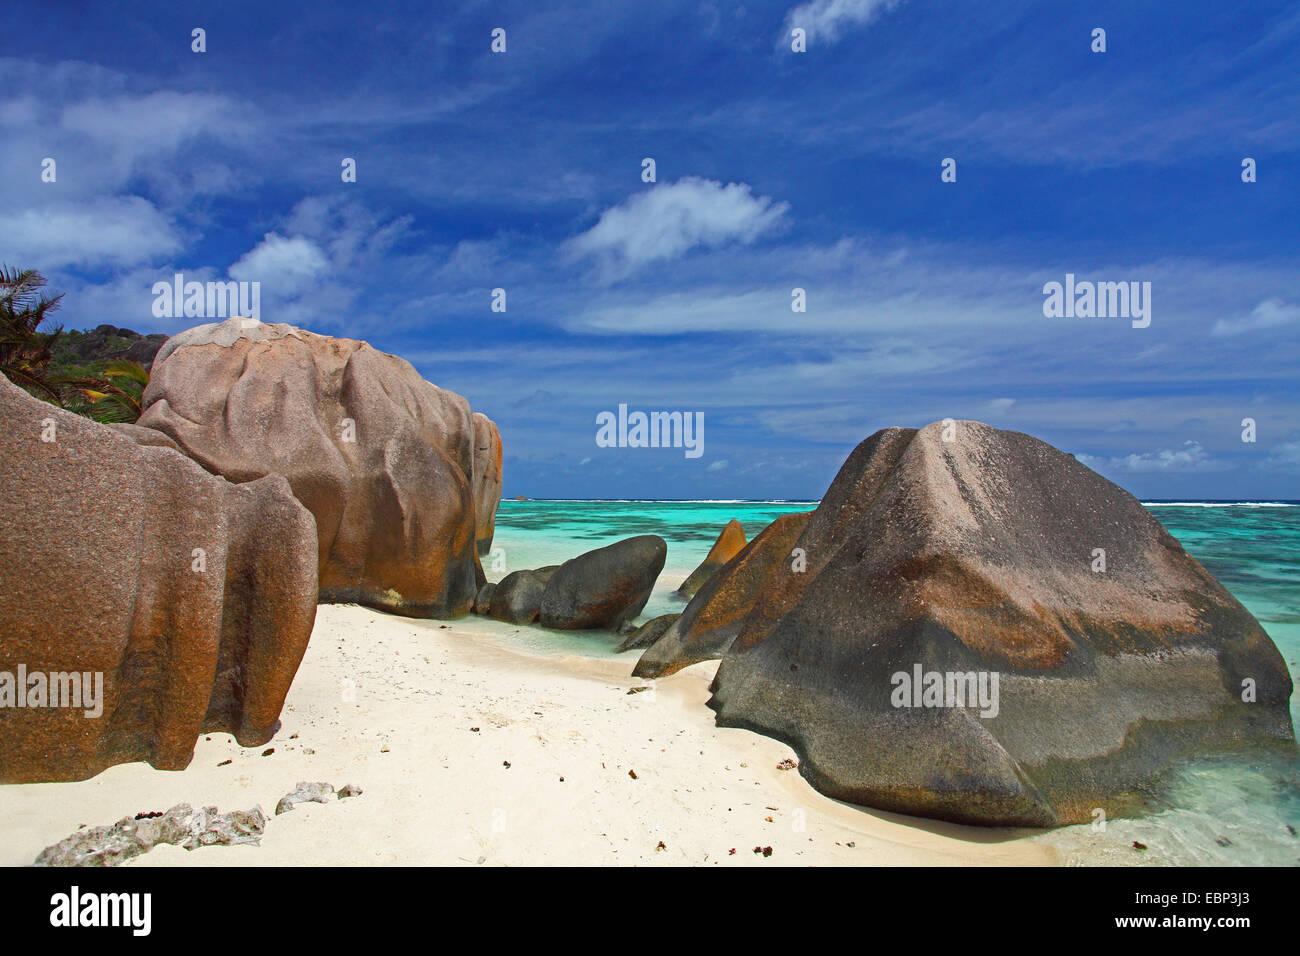 granite rocks on the beach Anse Source d'Argent, Seychelles, La Digue - Stock Image